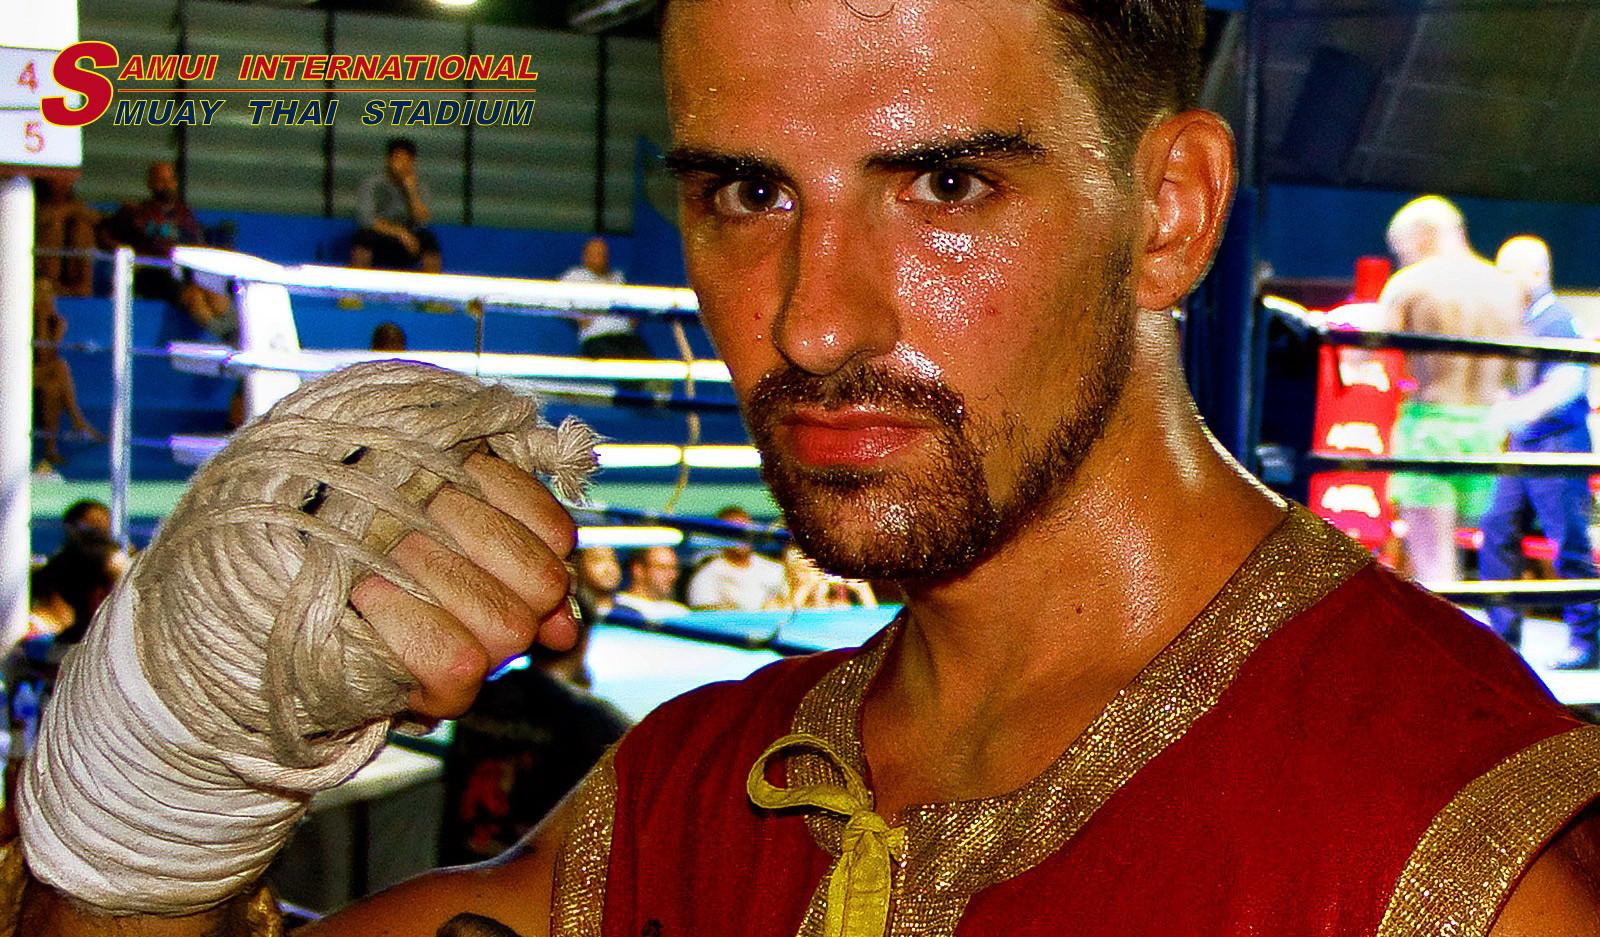 thai-fight-samui-international-muay-thai